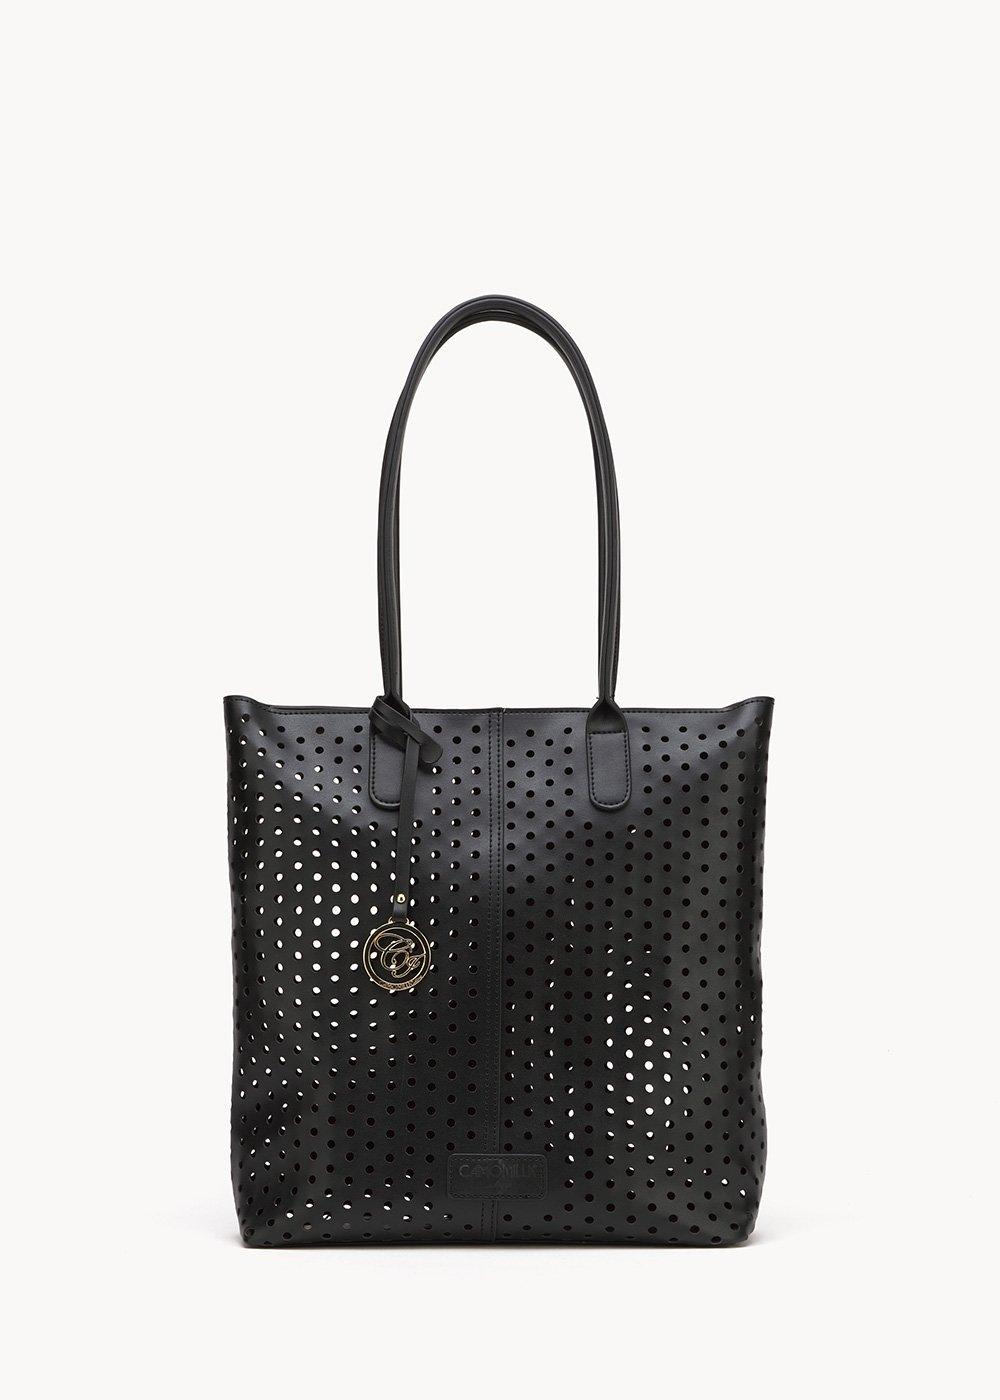 Shopping bag Blyth traforata - Black - Donna